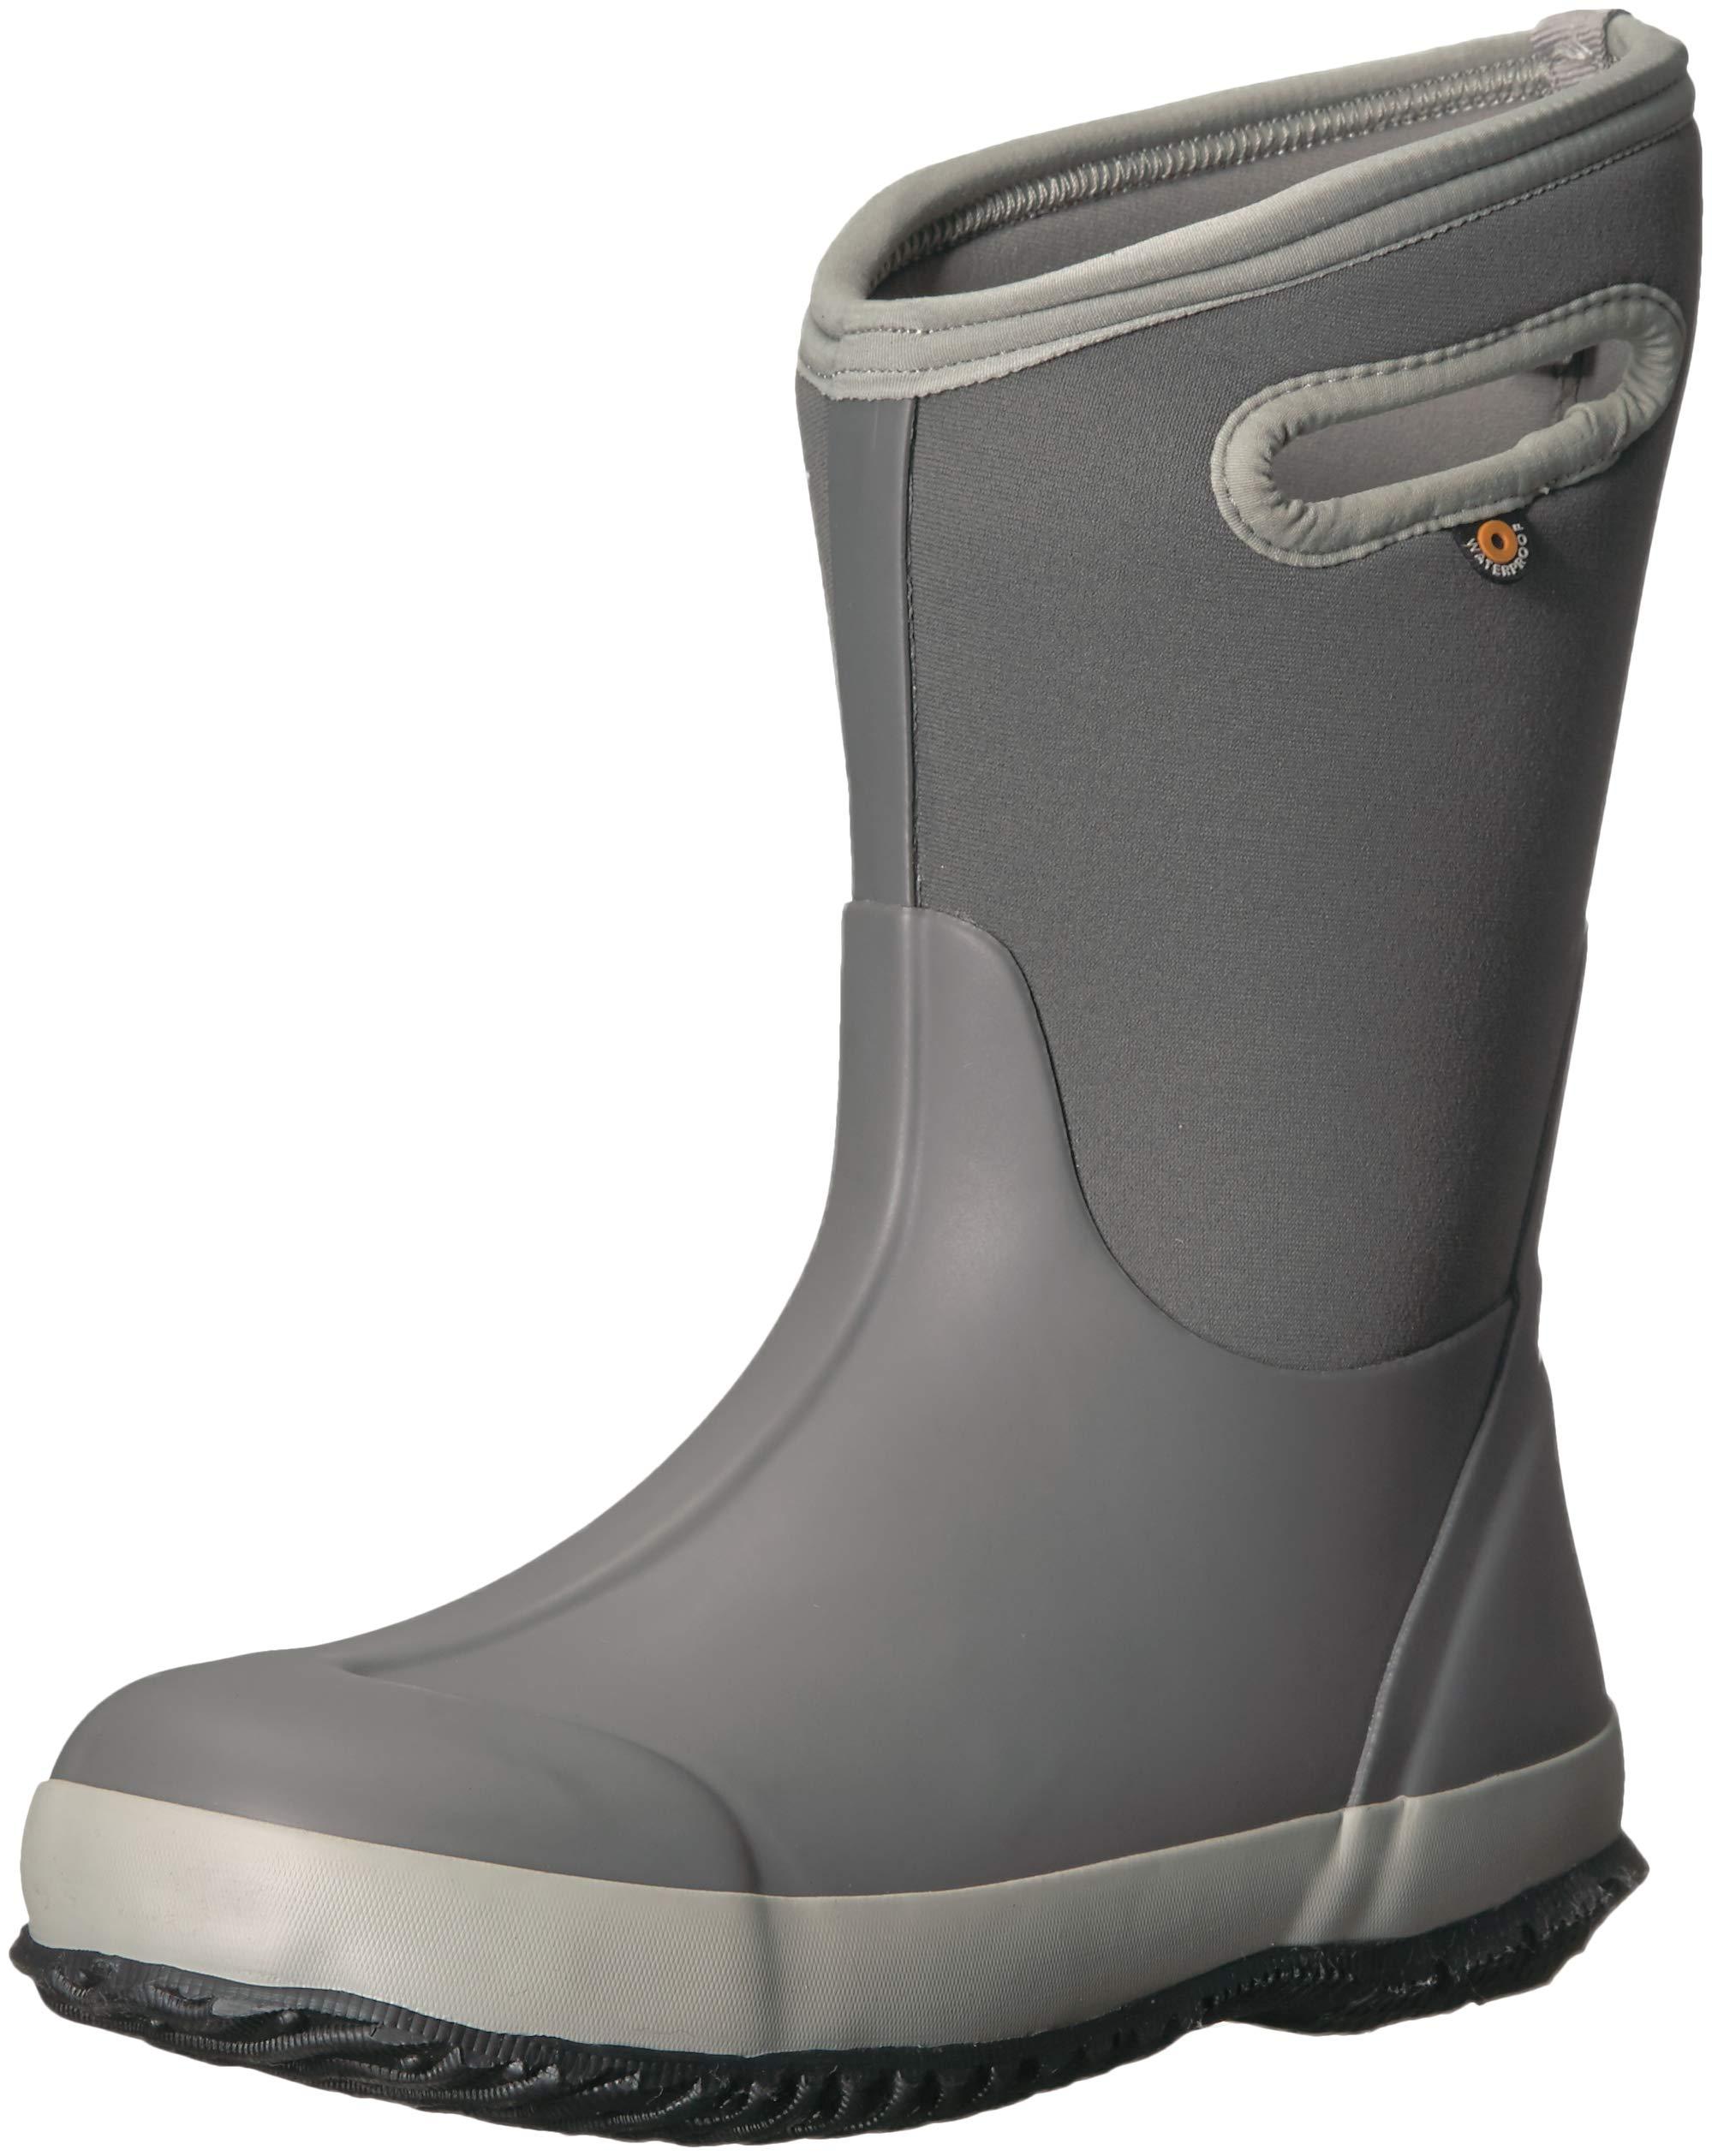 Bogs Classic High Waterproof Insulated Rubber Neoprene Rain Boot Snow, Matte Light Gray 3 M US Little Kid